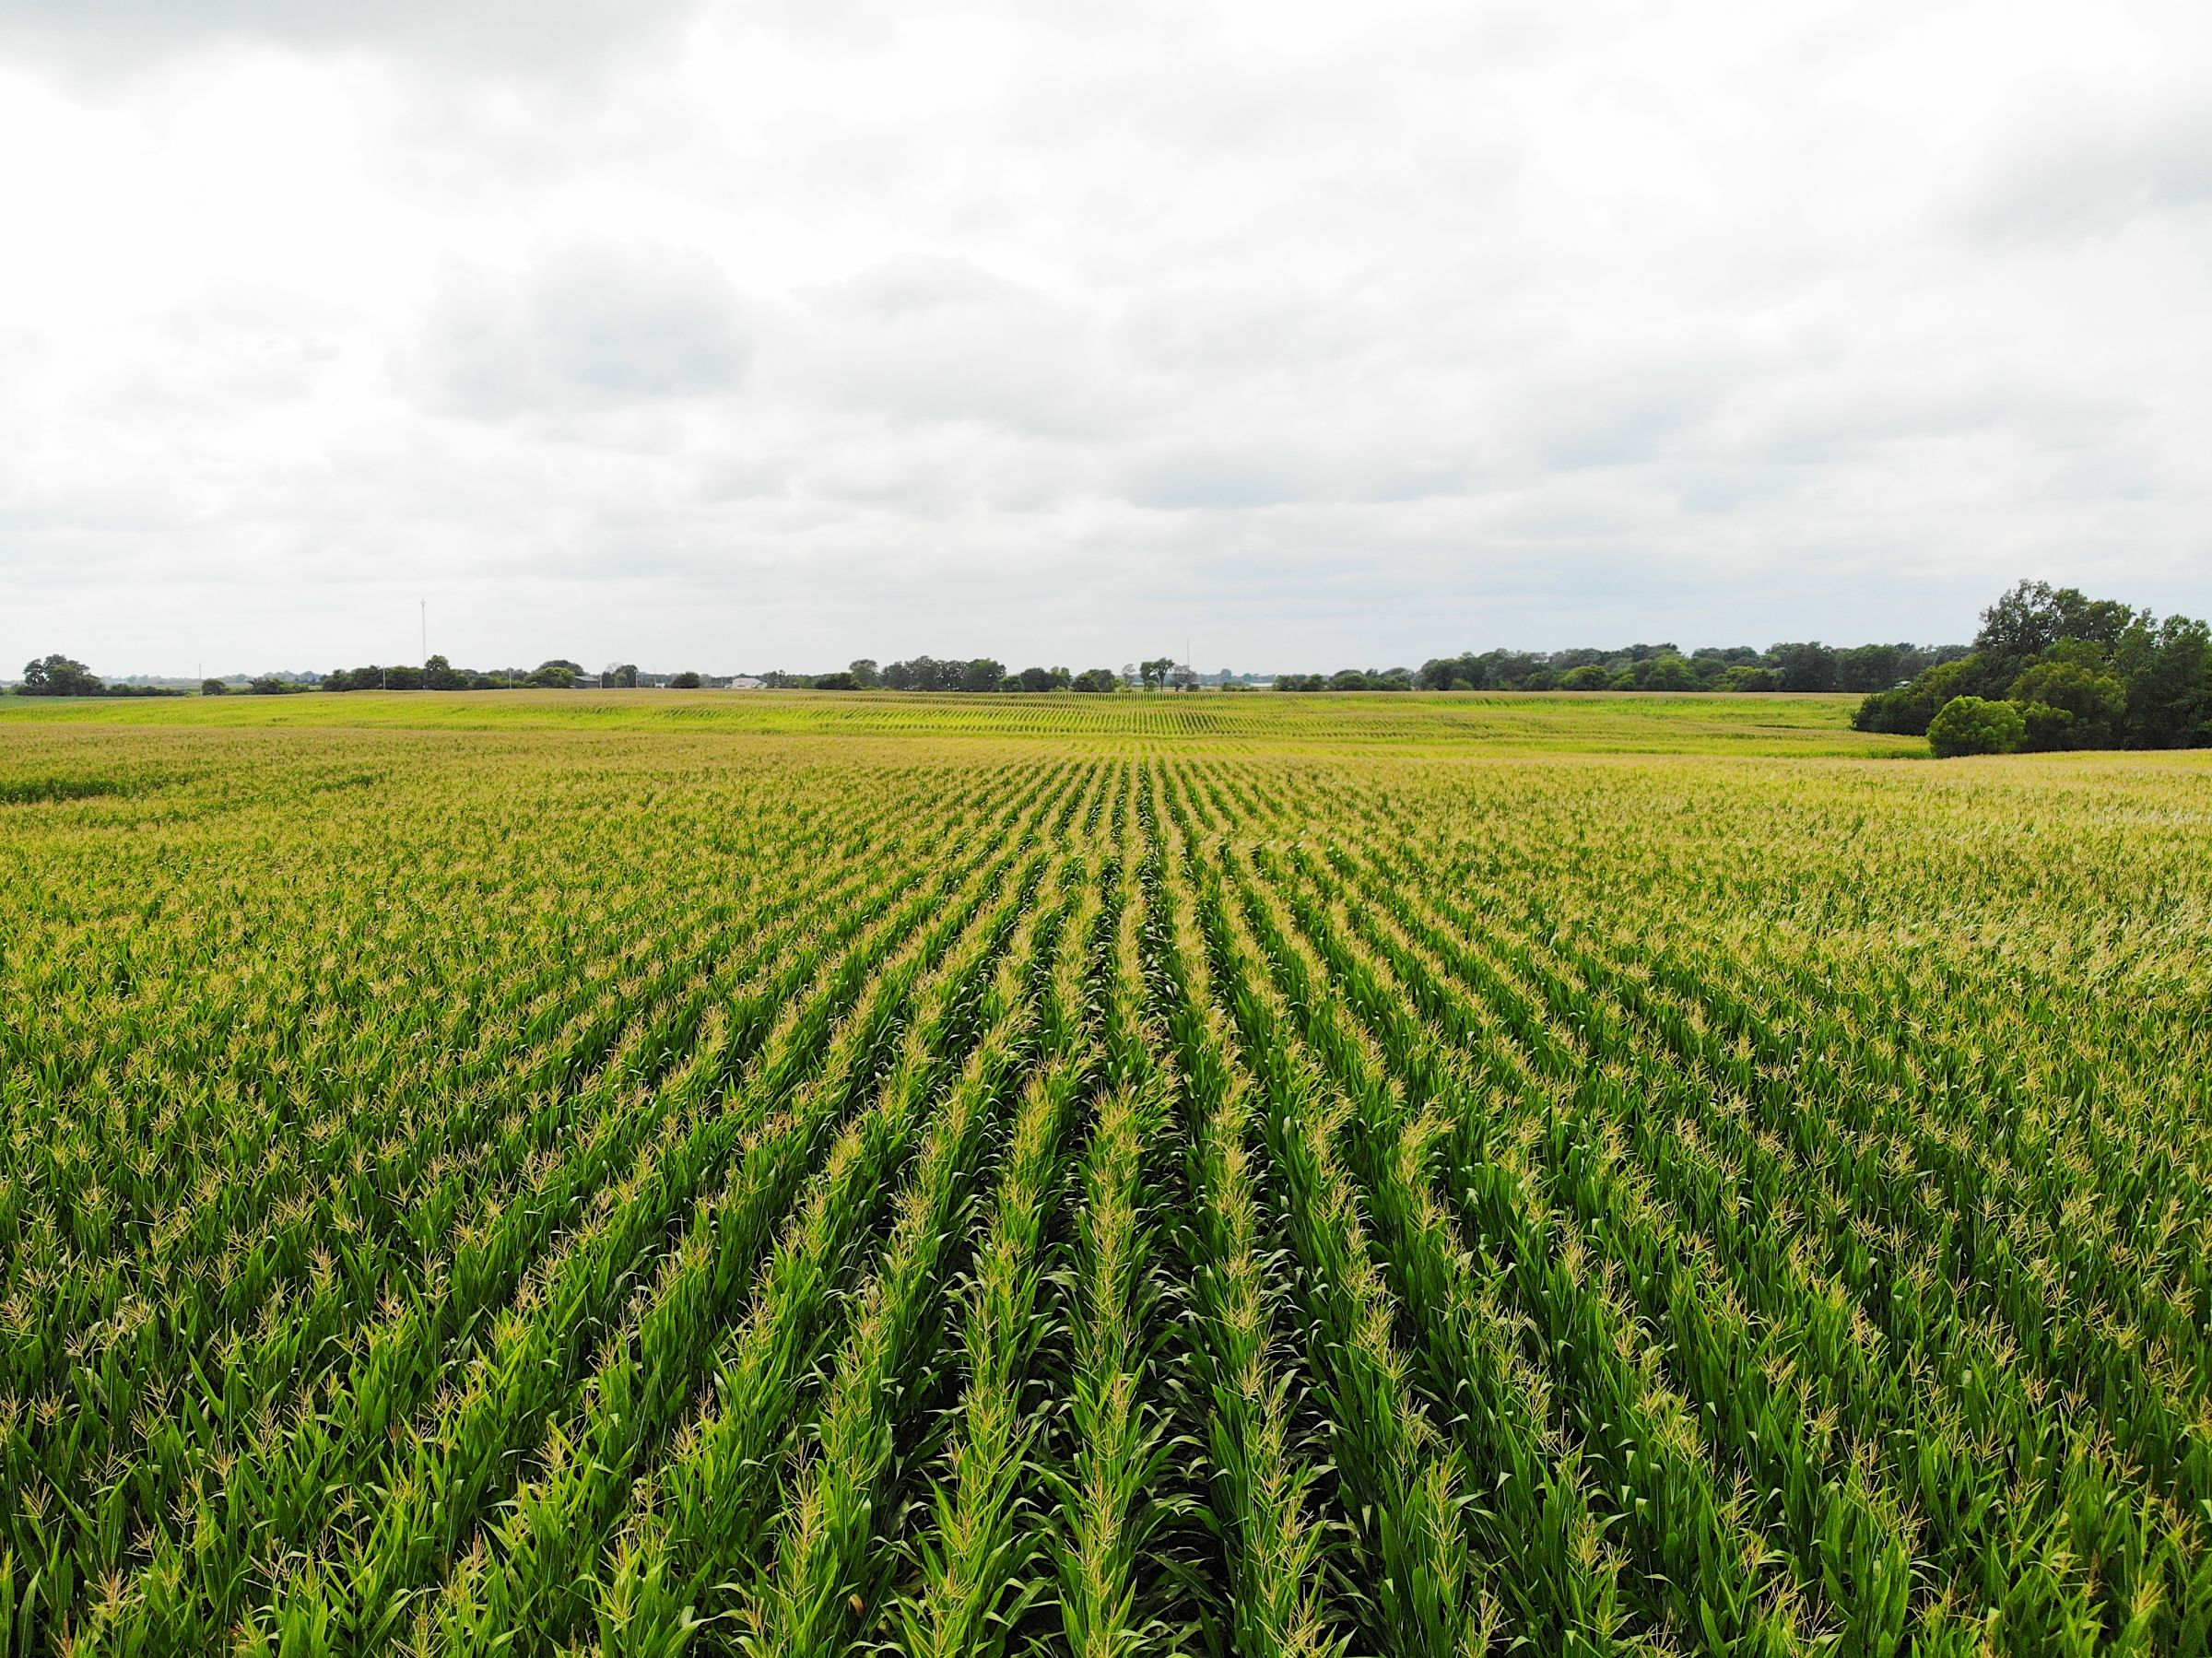 land-clarke-county-iowa-72-acres-listing-number-15106-3-2020-08-09-034303.jpg